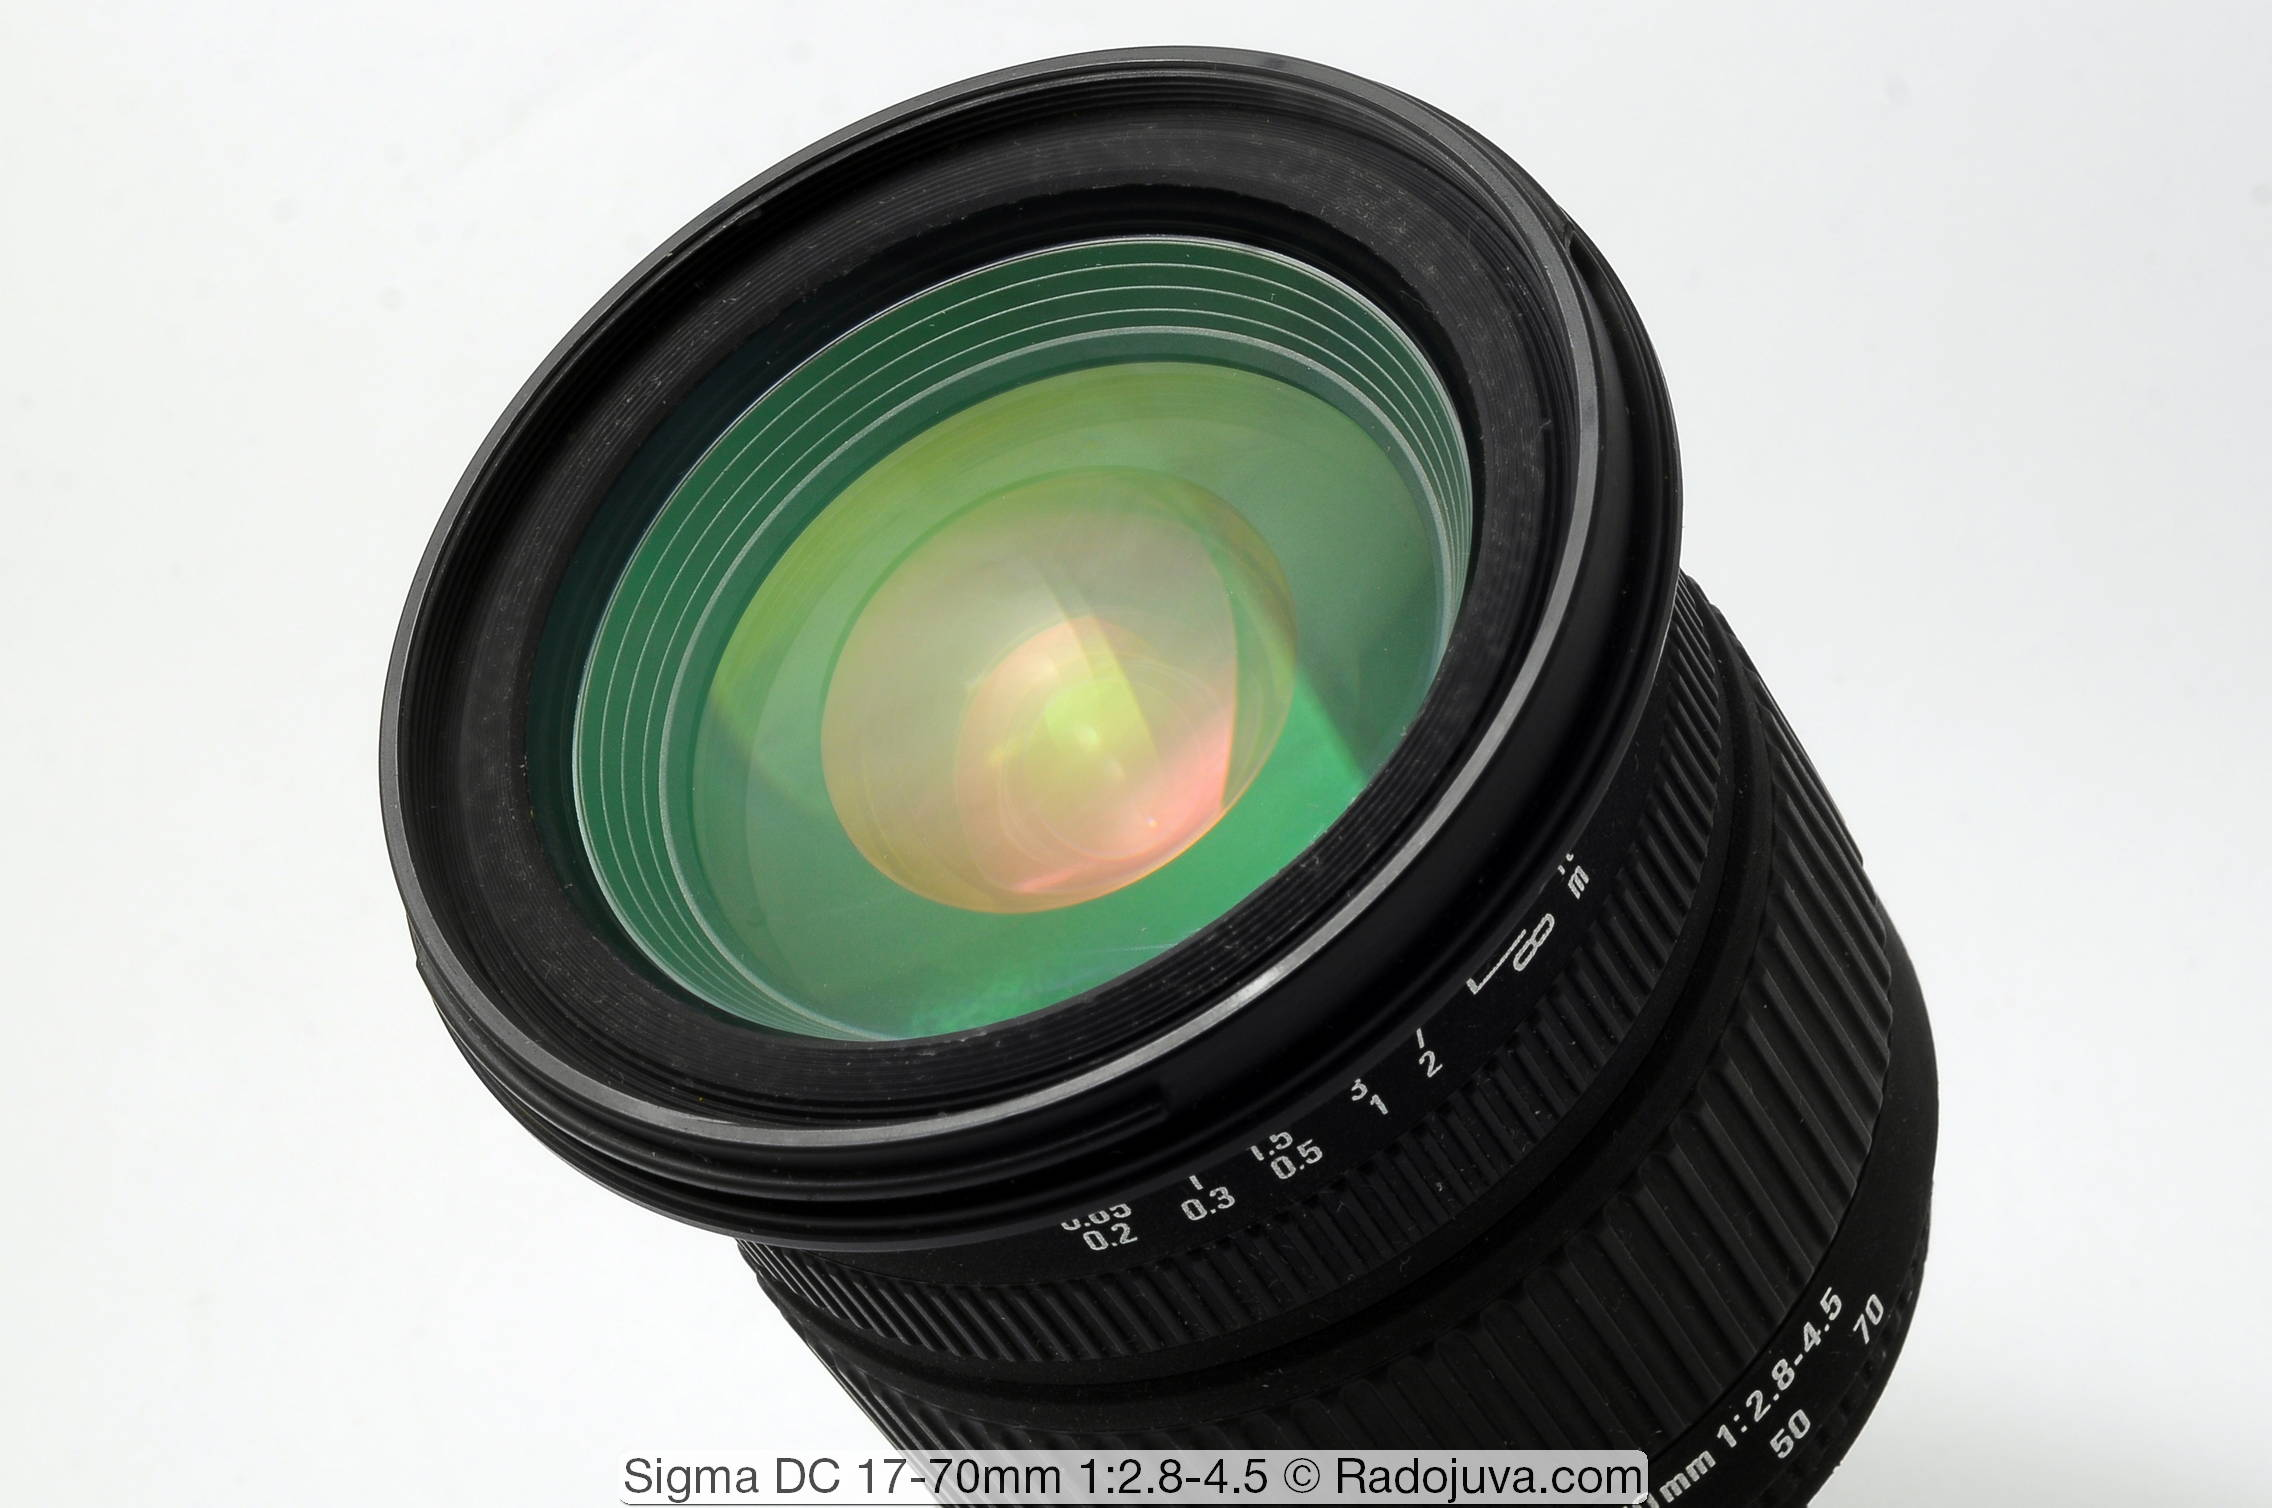 Sigma DC 17-70mm 1:2.8-4.5